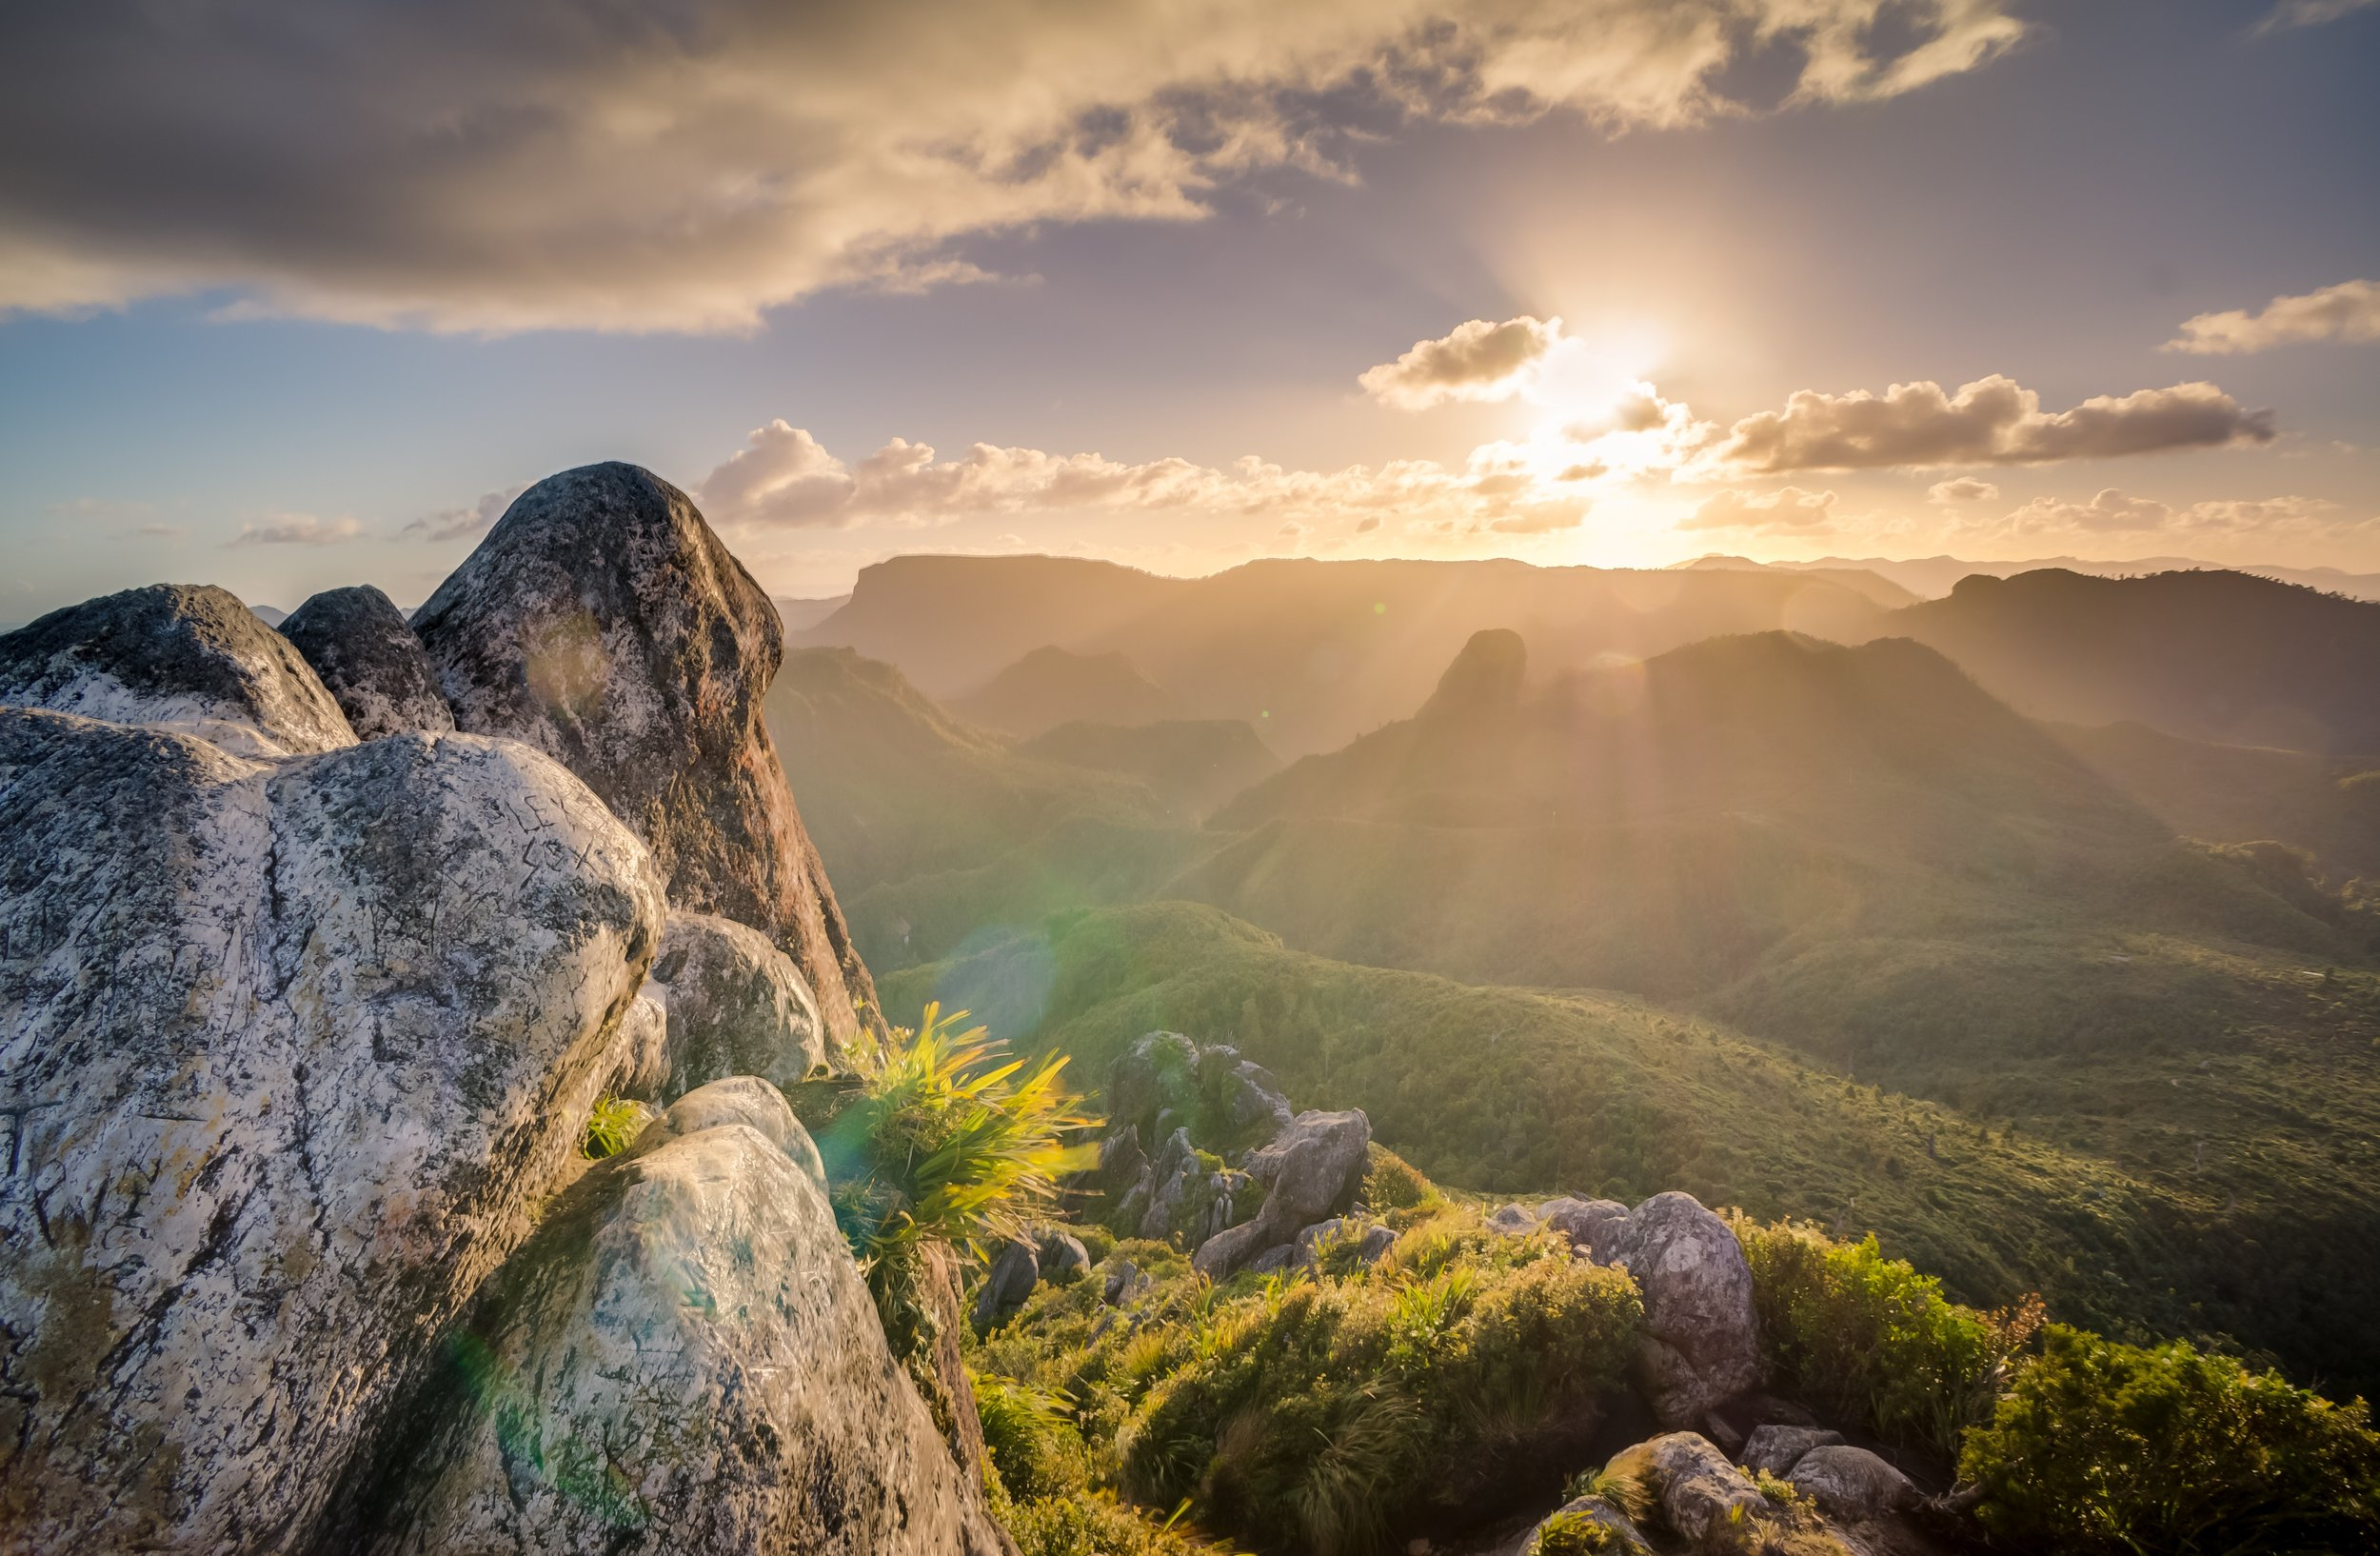 YANG YIN YOGA - AwakenToneImprove Posture & Balance